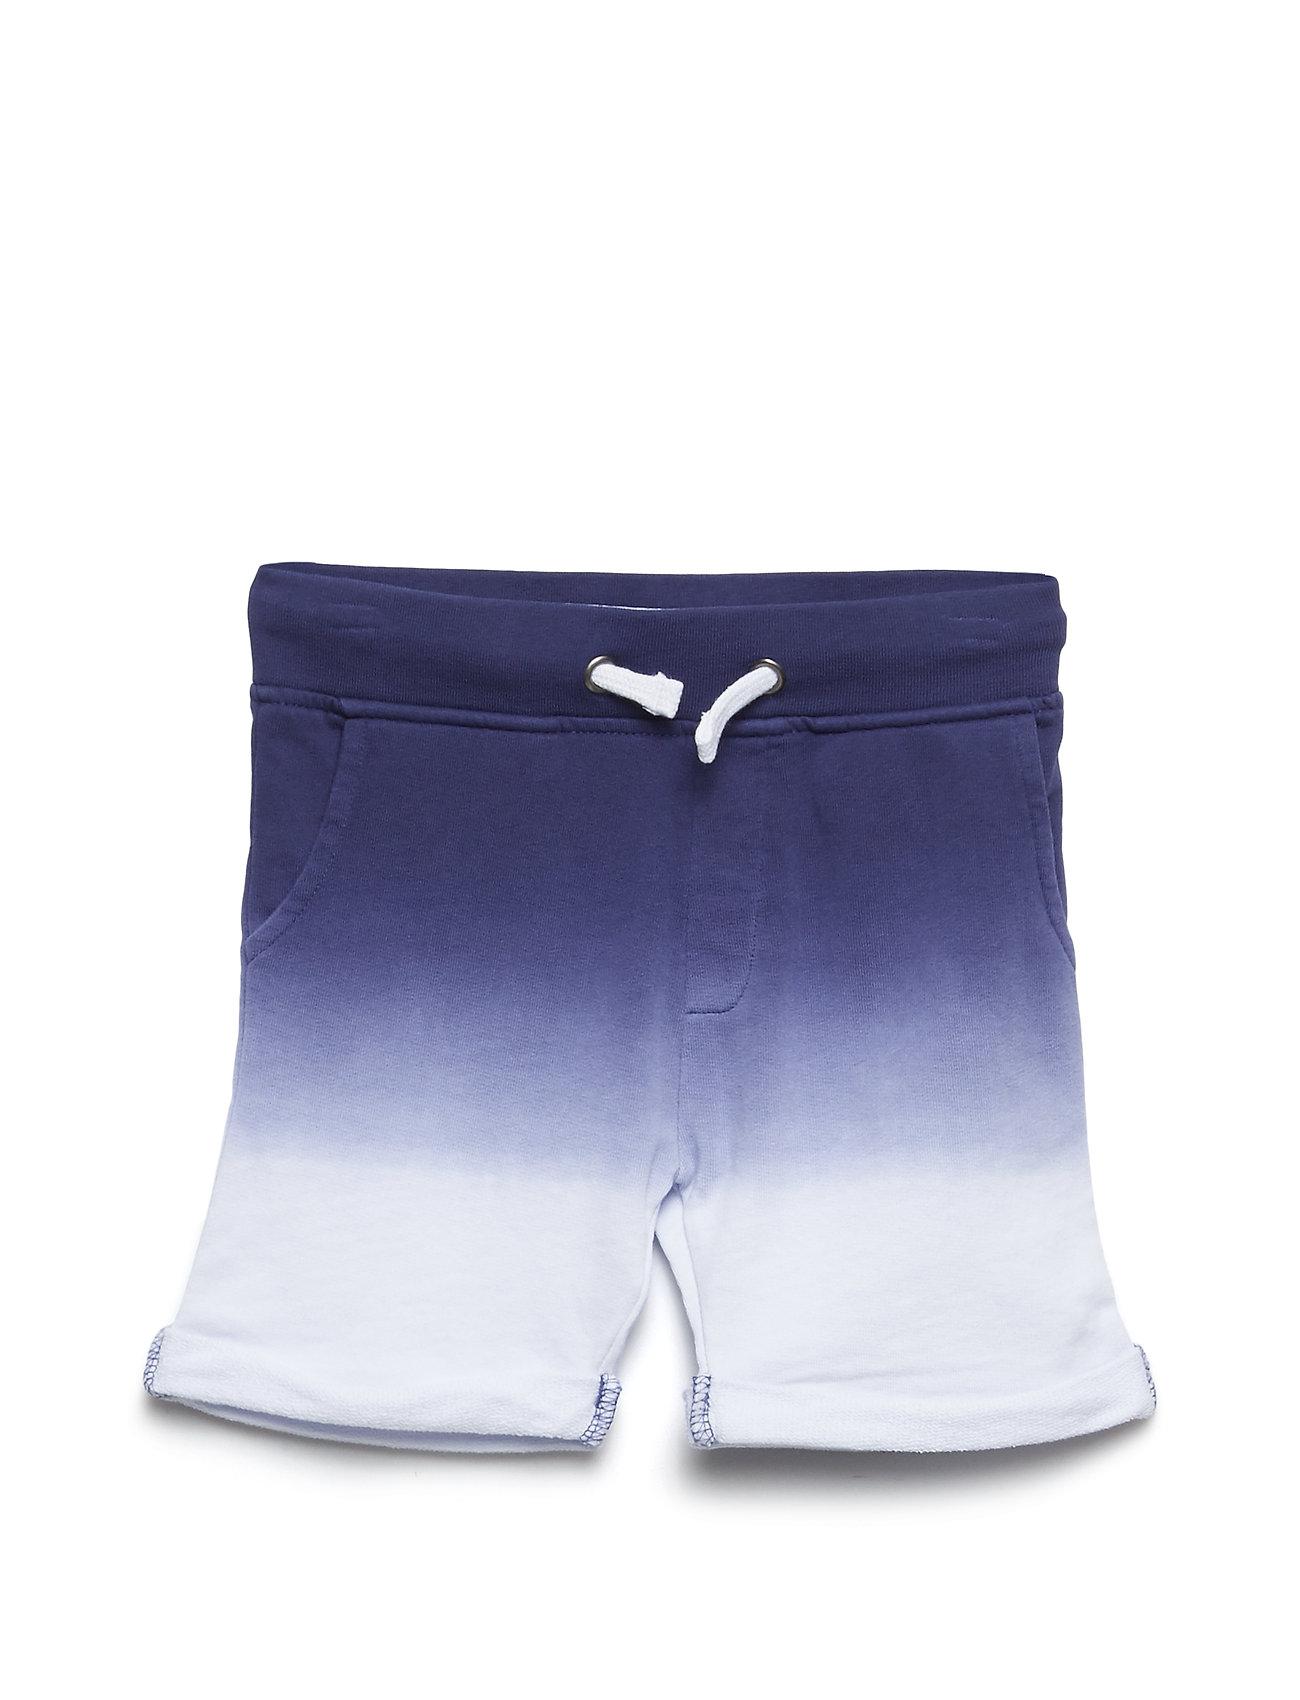 Leece Shorts - GUESS